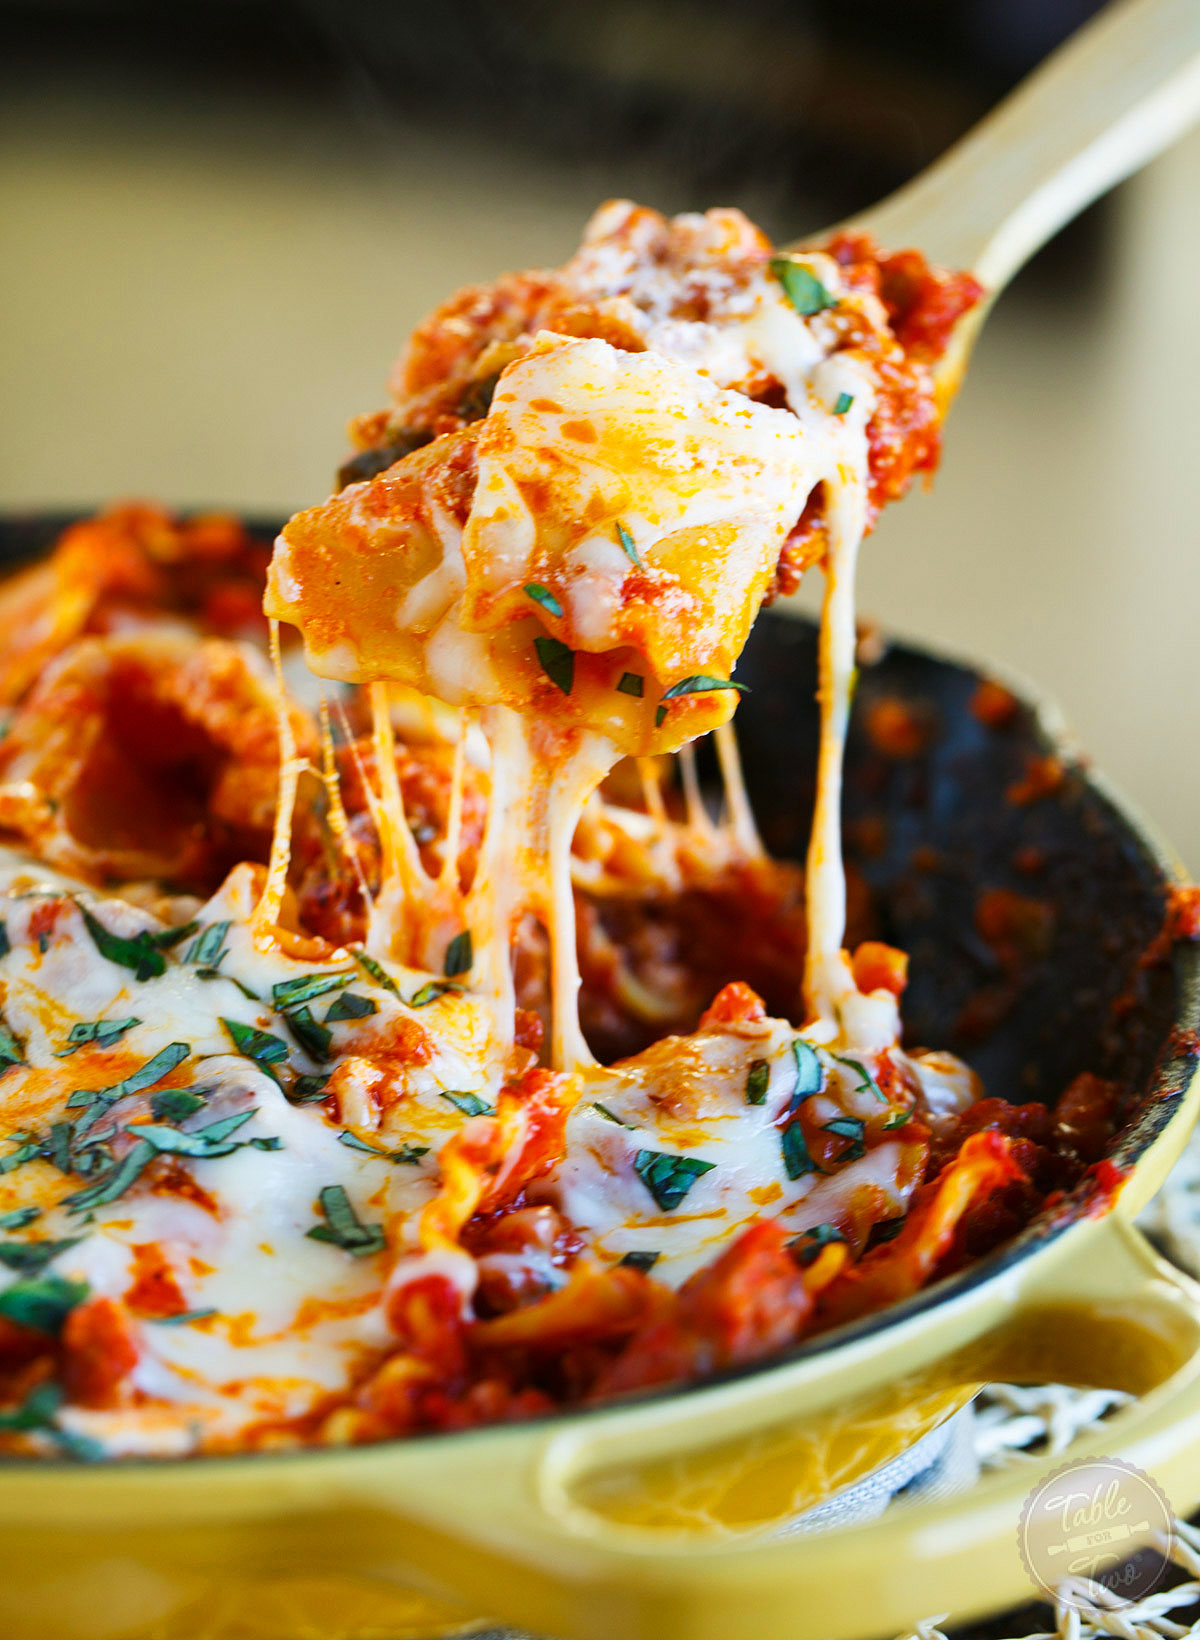 Ultimate Skillet Lasagna Table For Two 174 By Julie Wampler